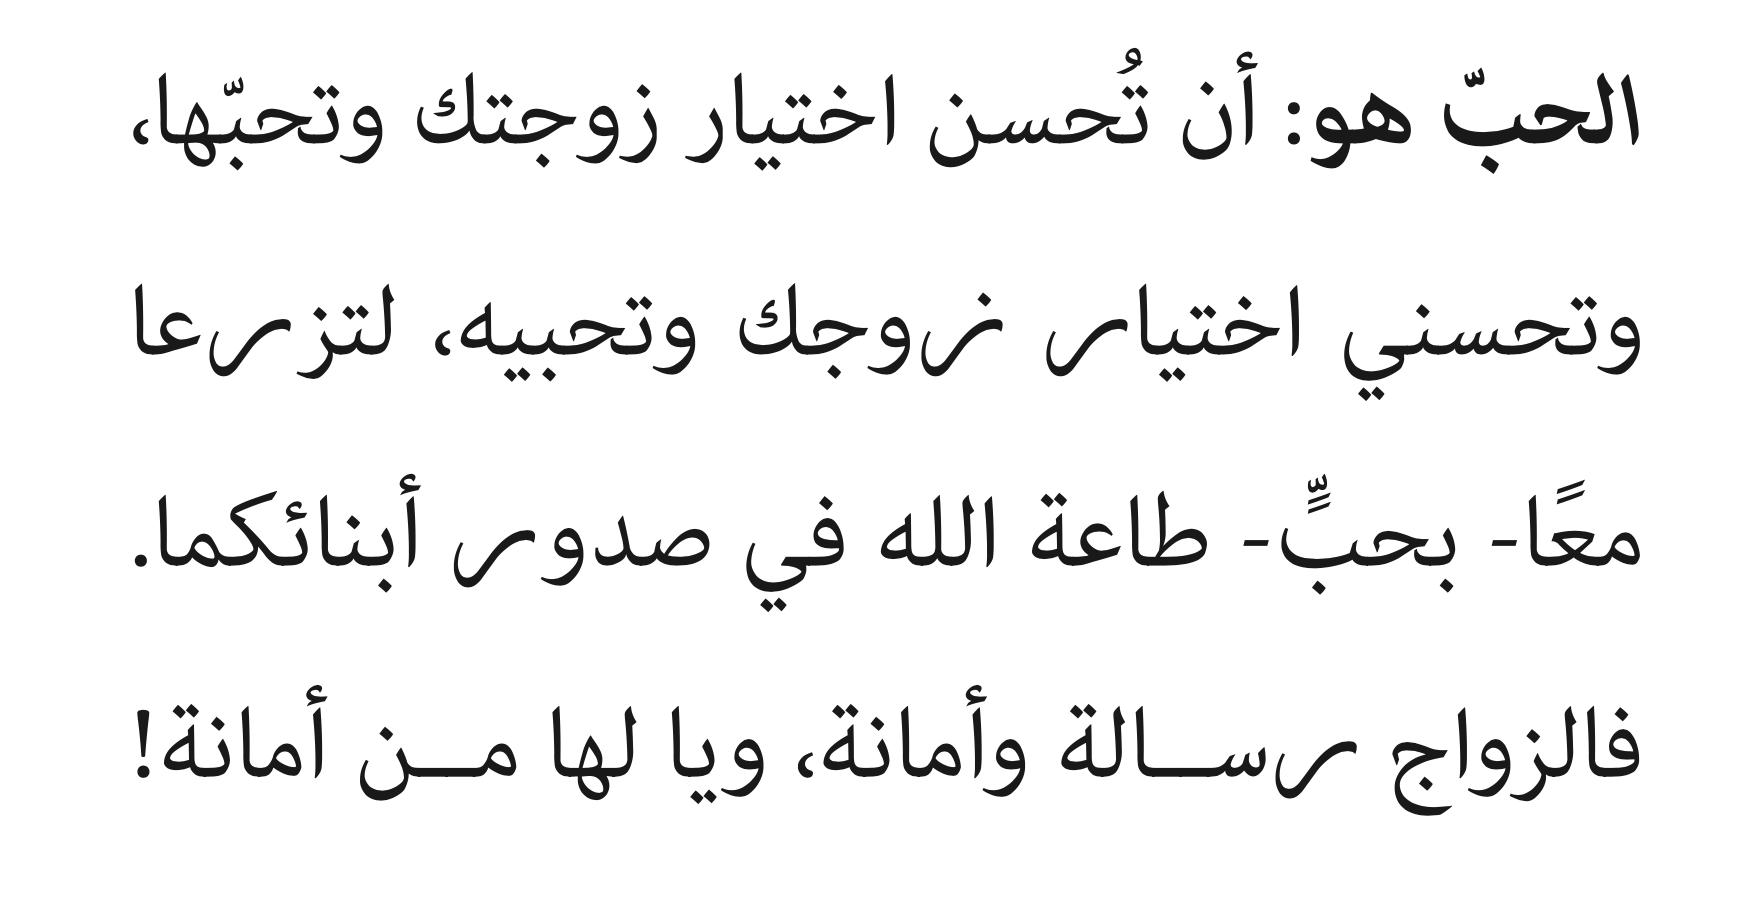 Pin By Marwa Fahmy On أقوال أعجبتني إقتباسات كتب Words Math Arabic Calligraphy